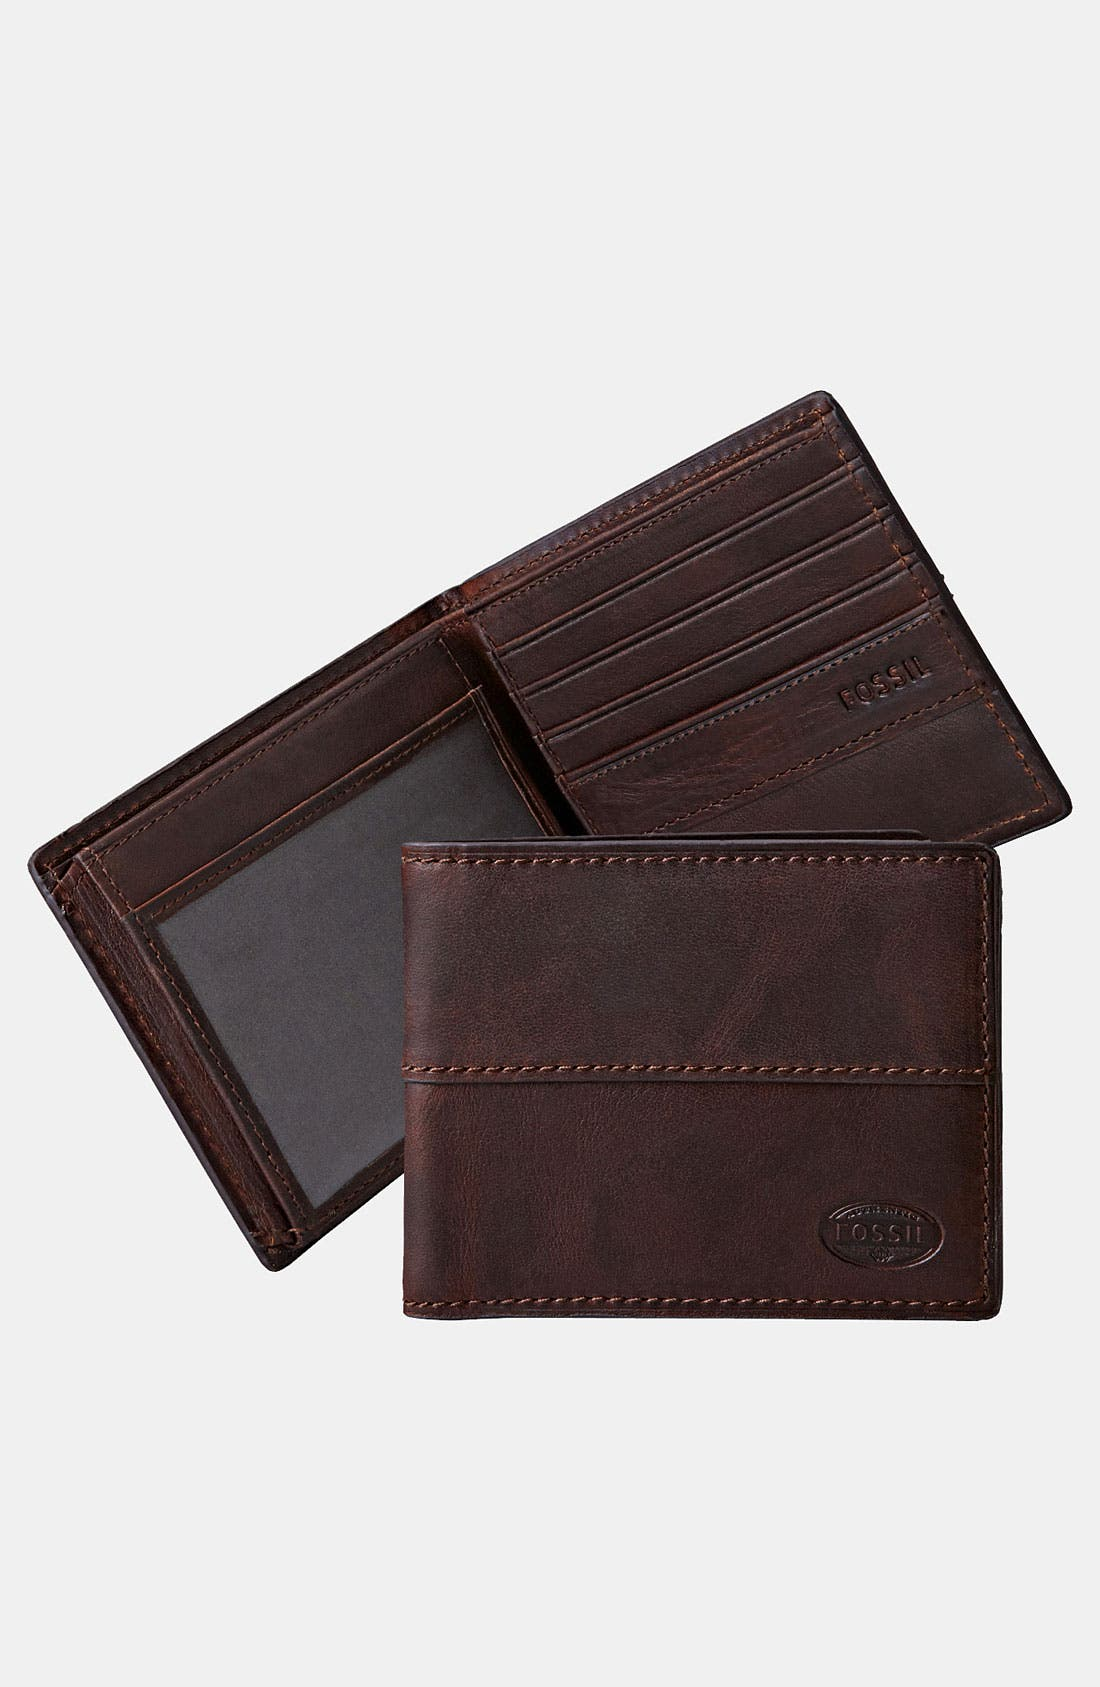 Alternate Image 1 Selected - Fossil 'Dillon' Traveler Wallet